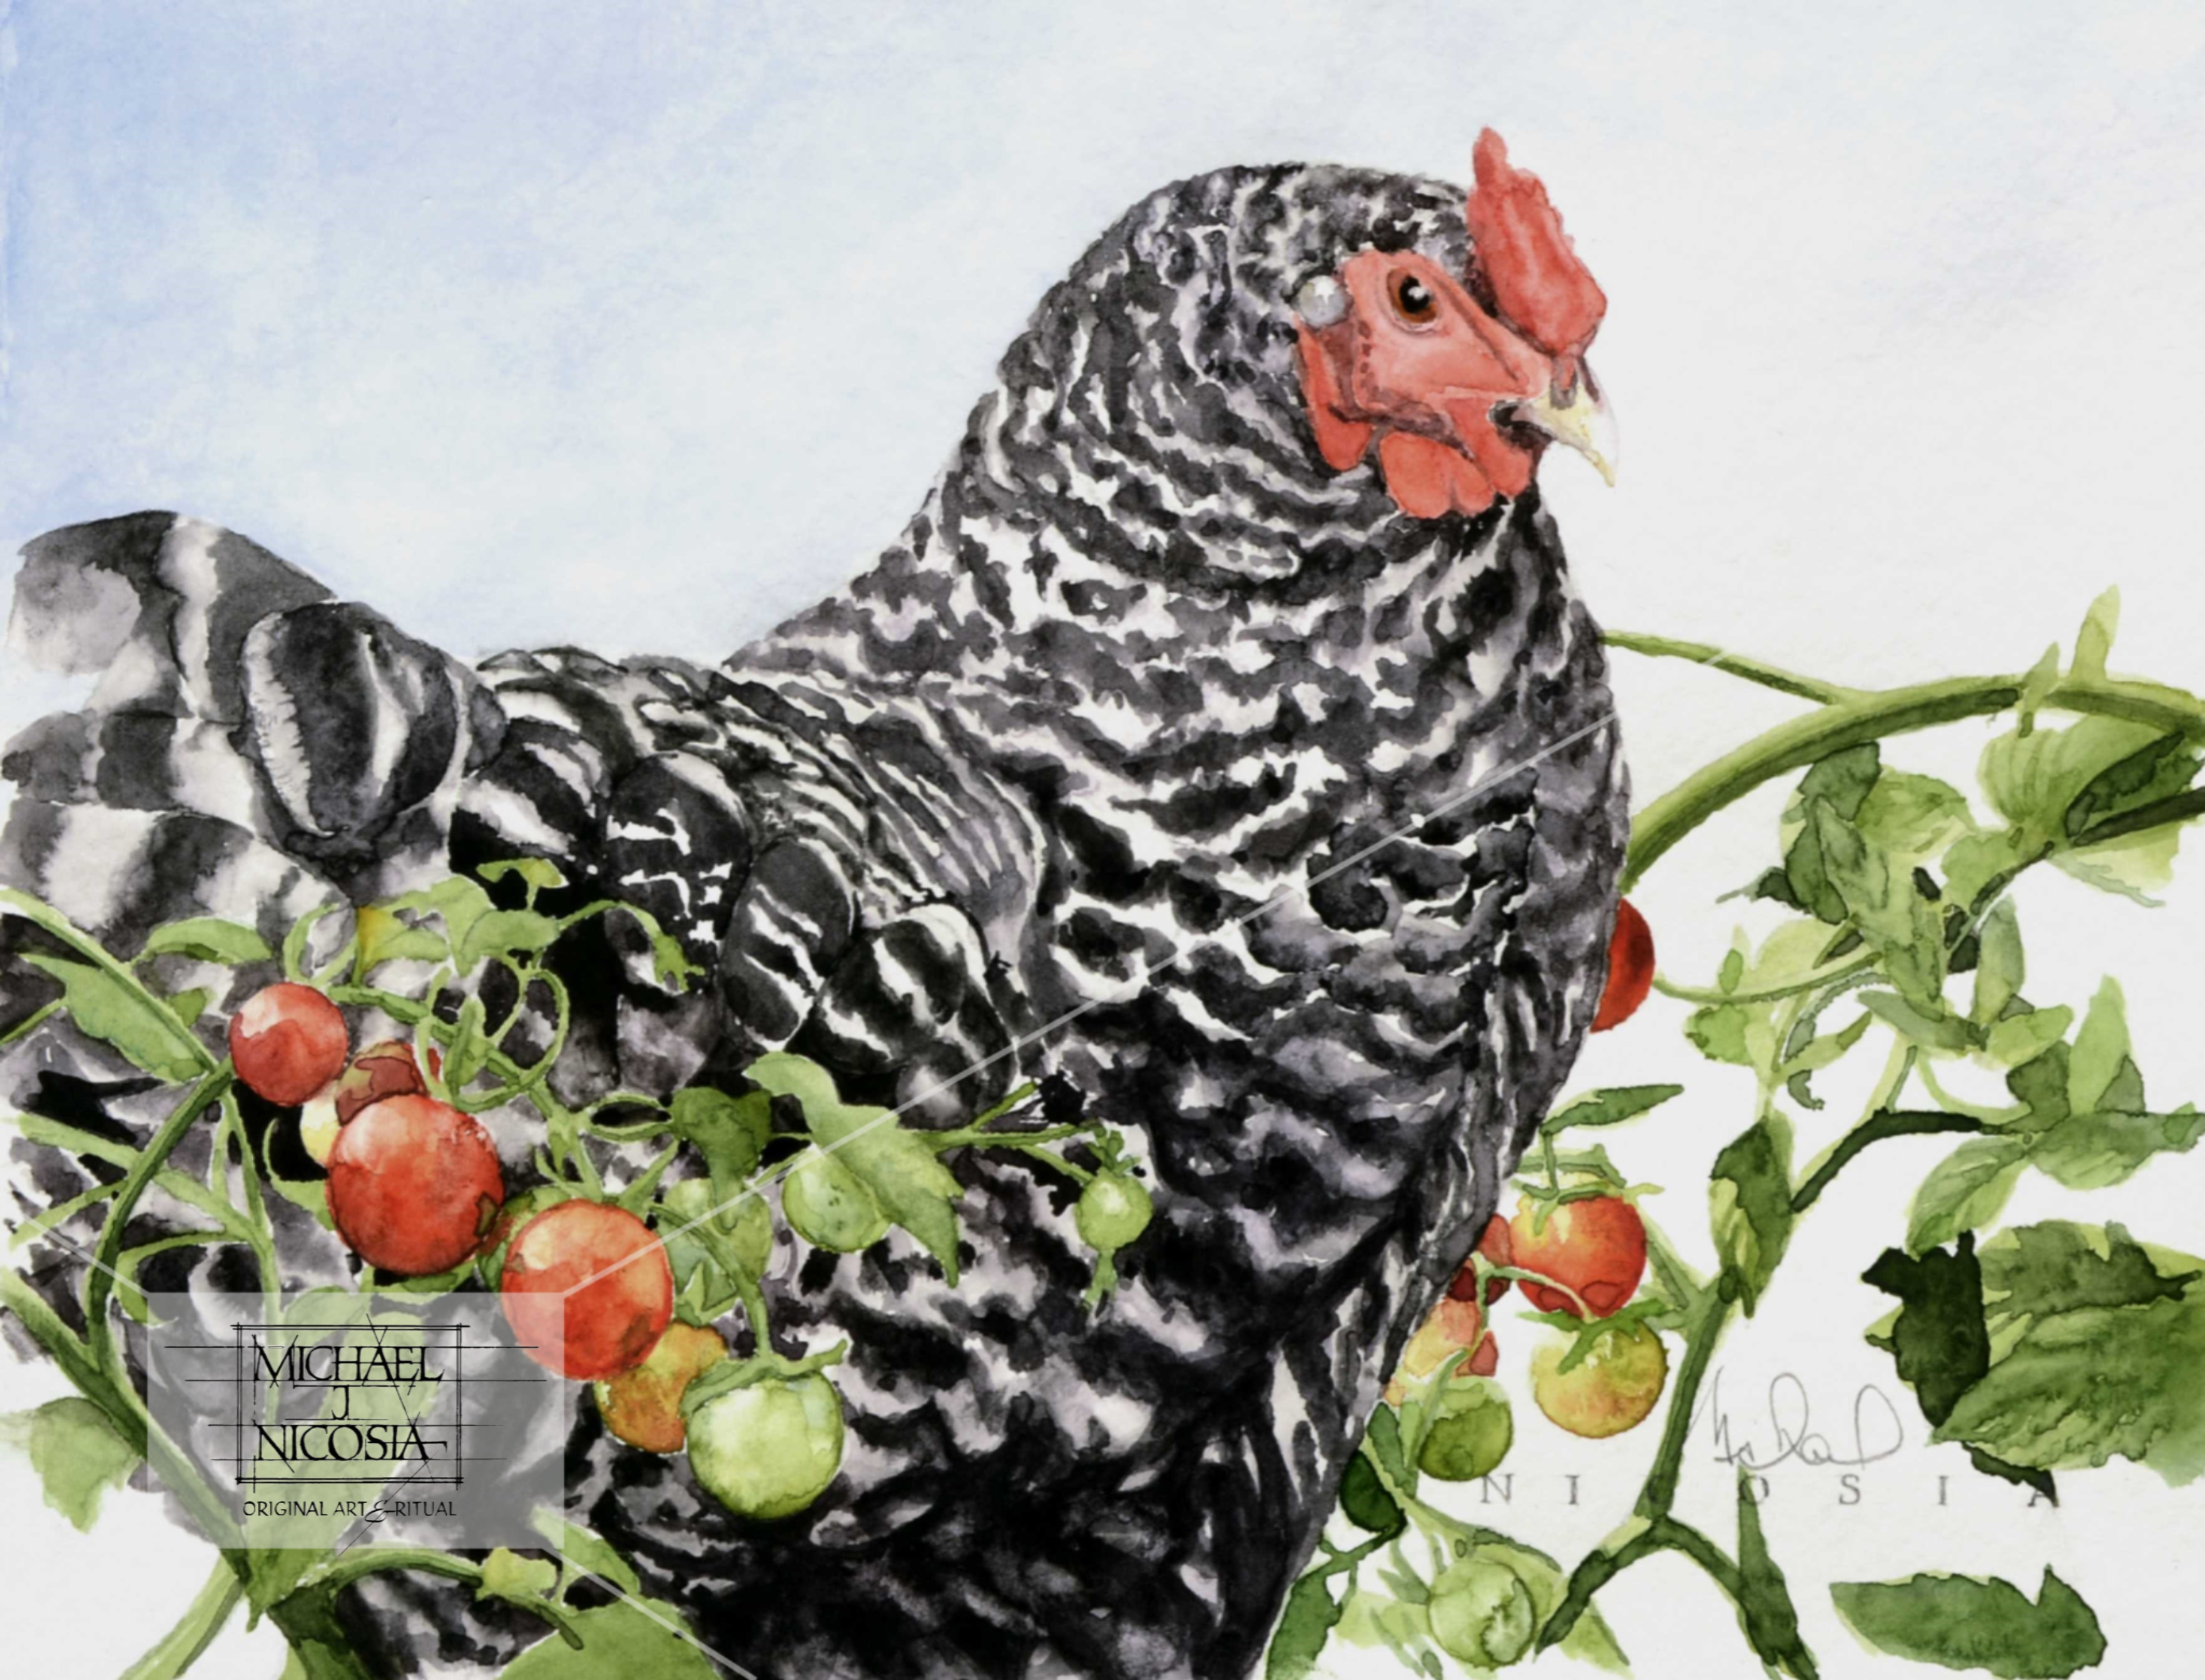 Henrietta, in the tomatoes again    watermark